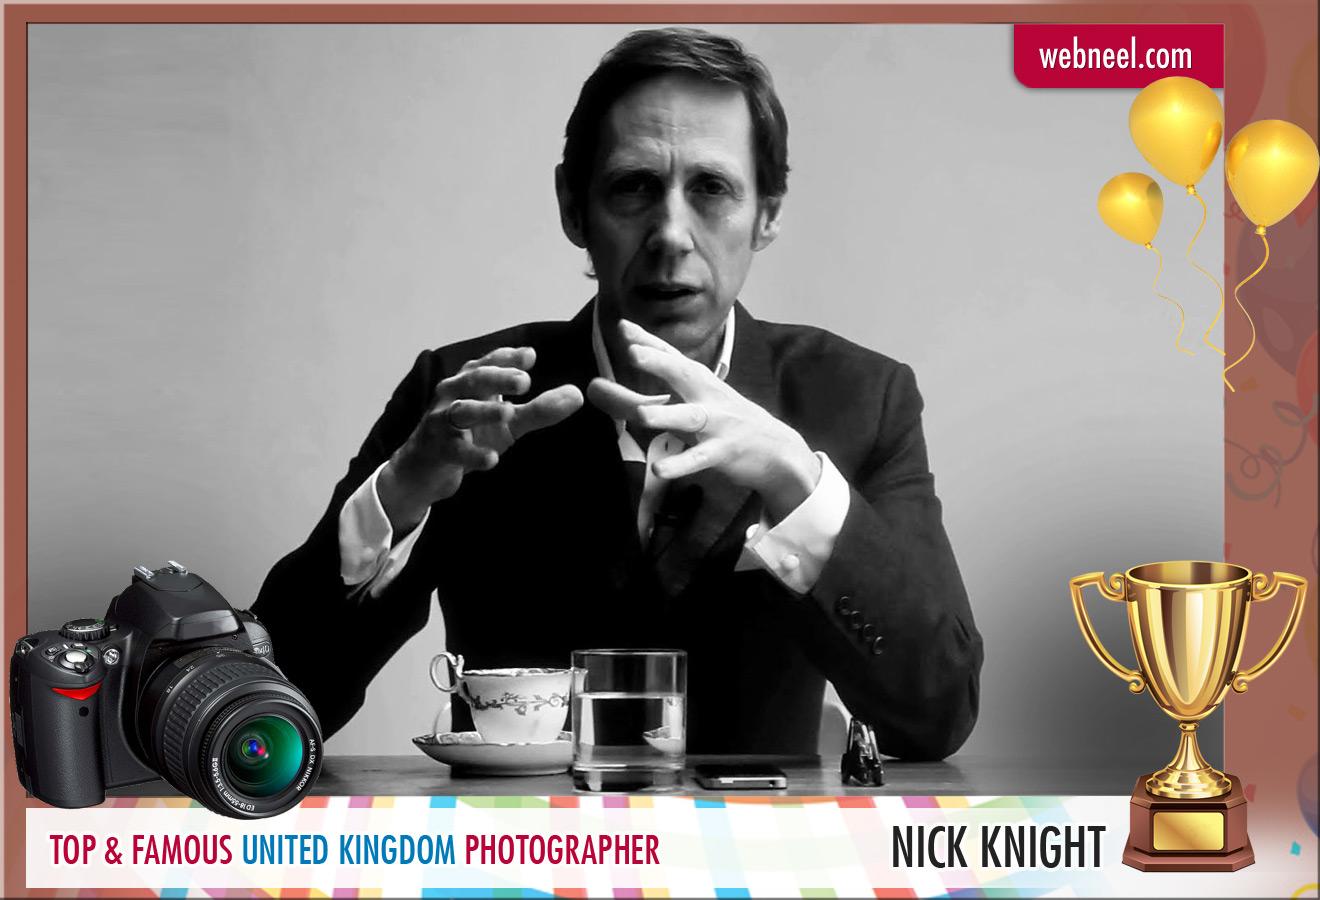 famous uk photographer nick knight